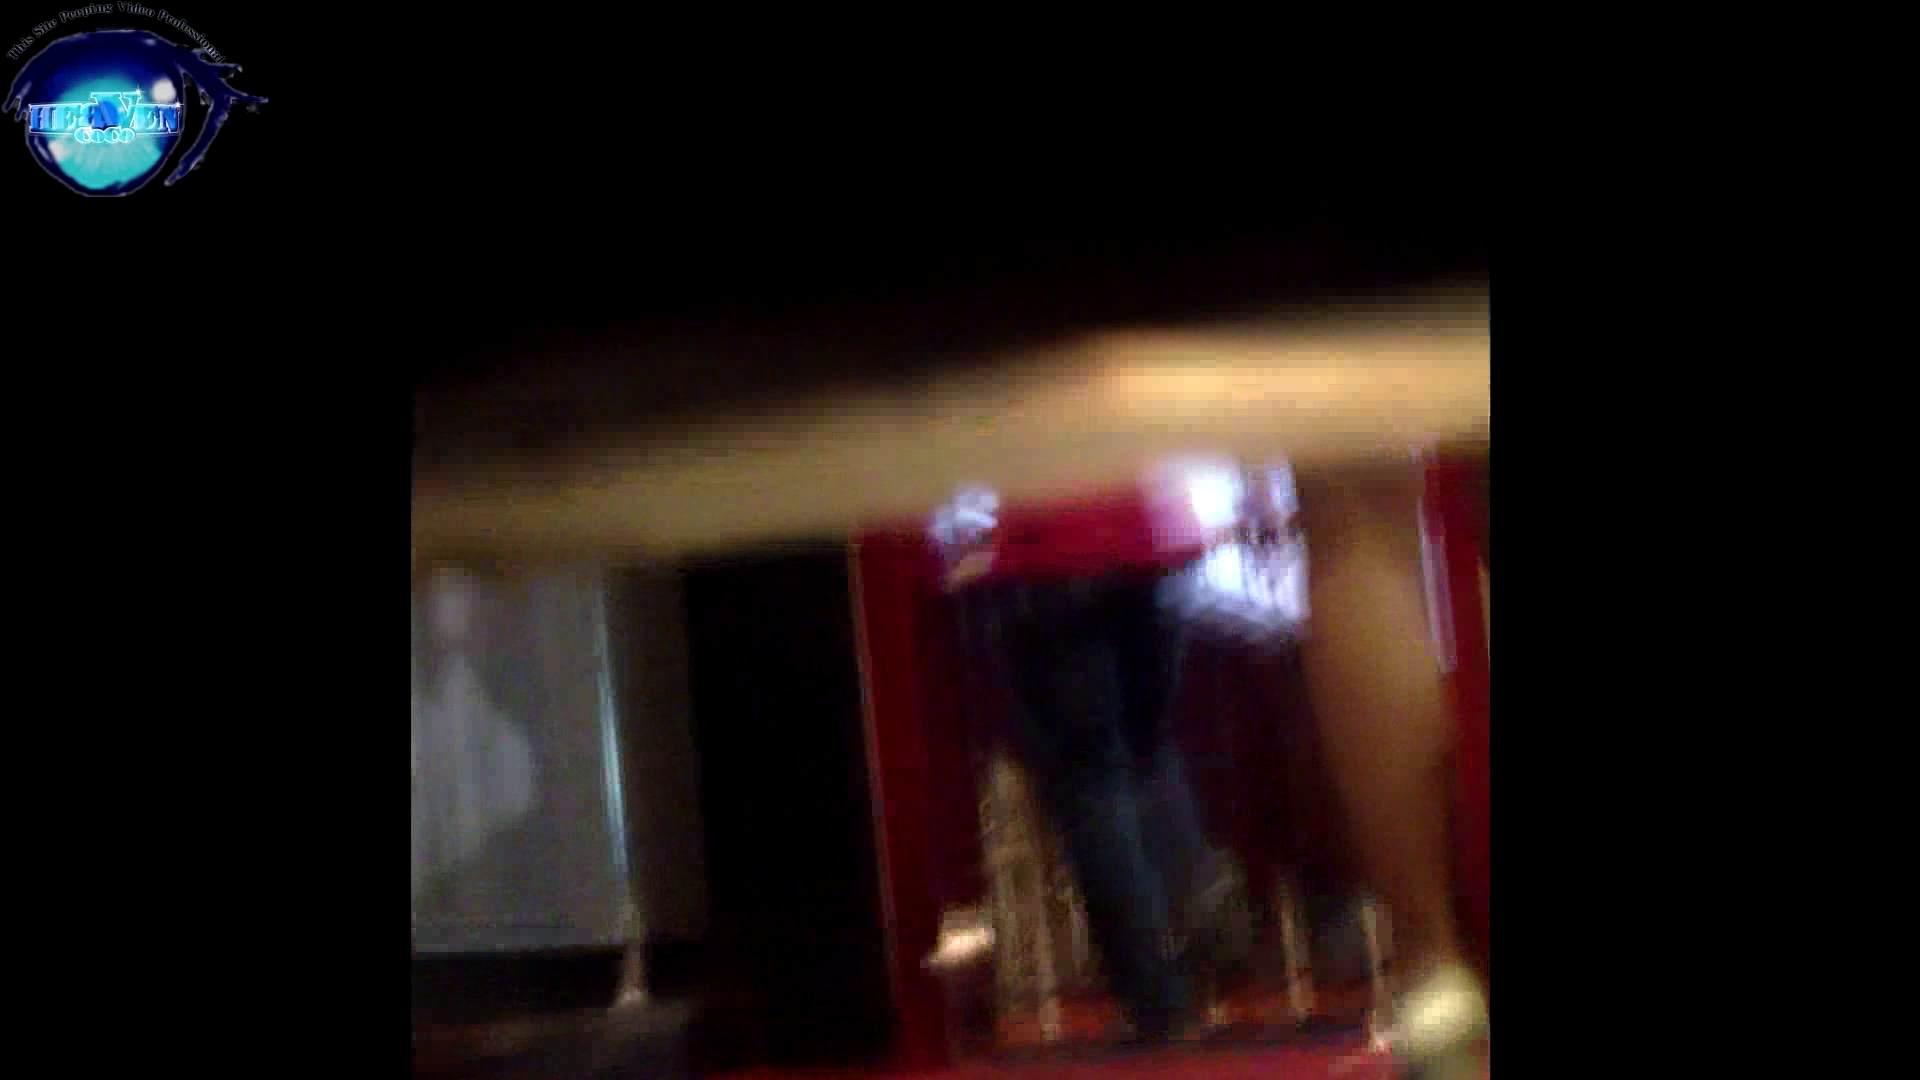 GOD HAND ファッションショッピングセンター盗撮vol.02後編 盗撮 | OLのエロ生活  94連発 22